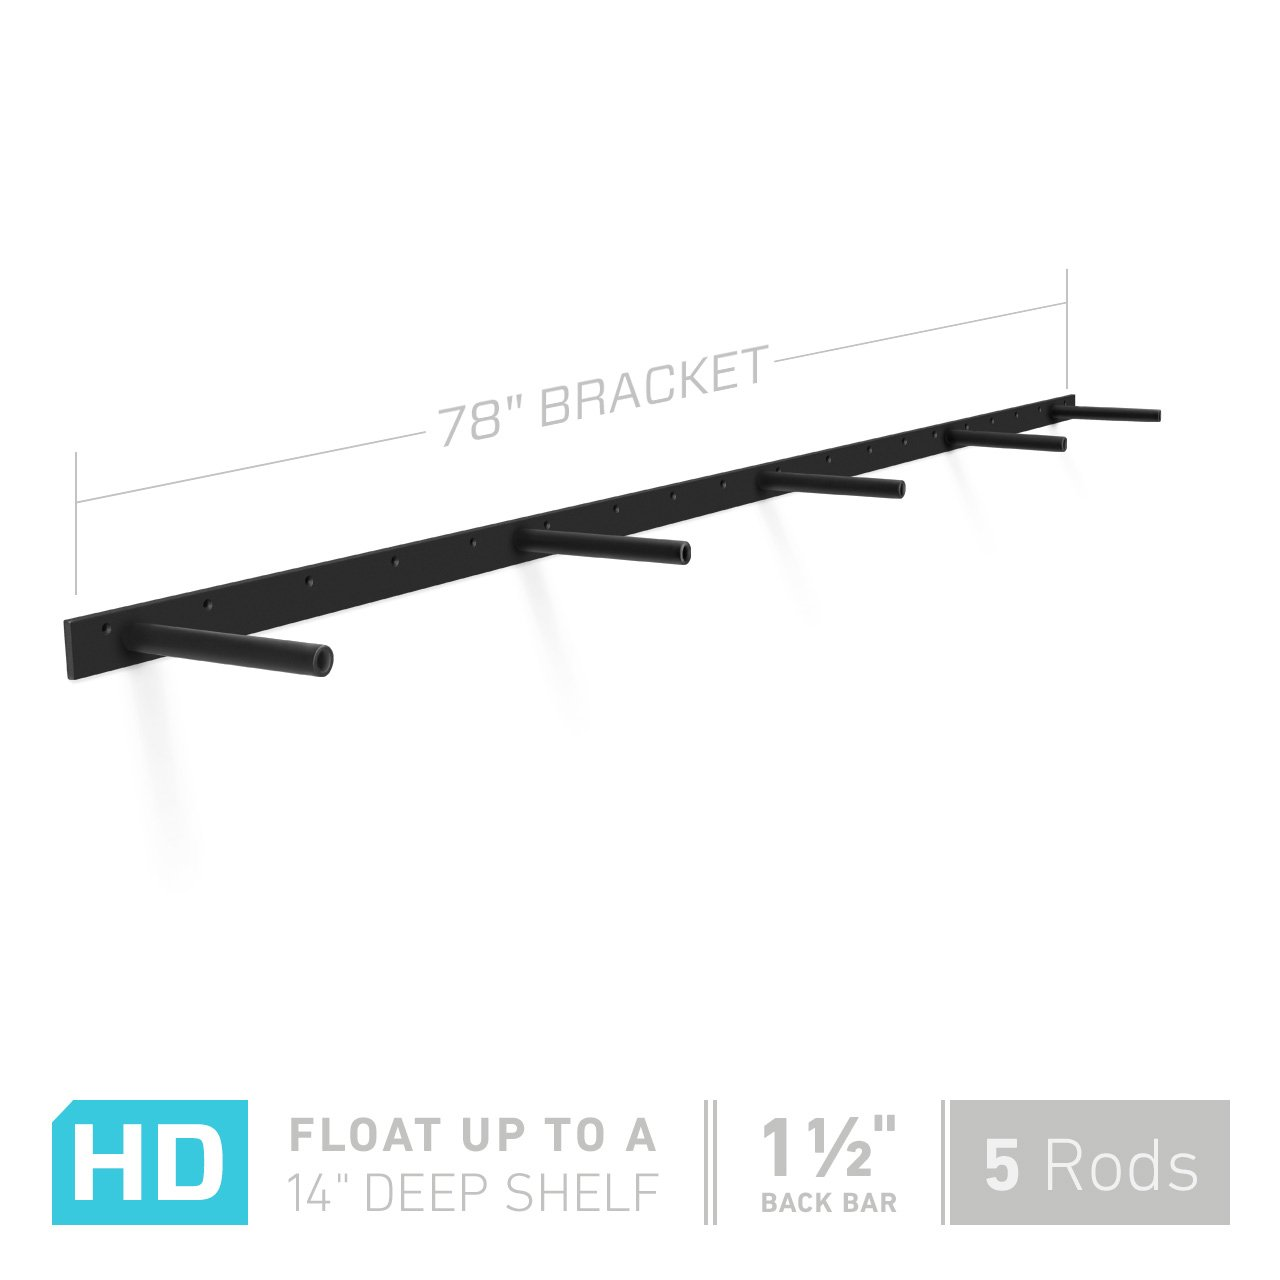 Shelfology 78'' Long Heavy Duty Hidden Shelf Bracket - For 80'' to 96'' floating shelves. Manufactured in USA